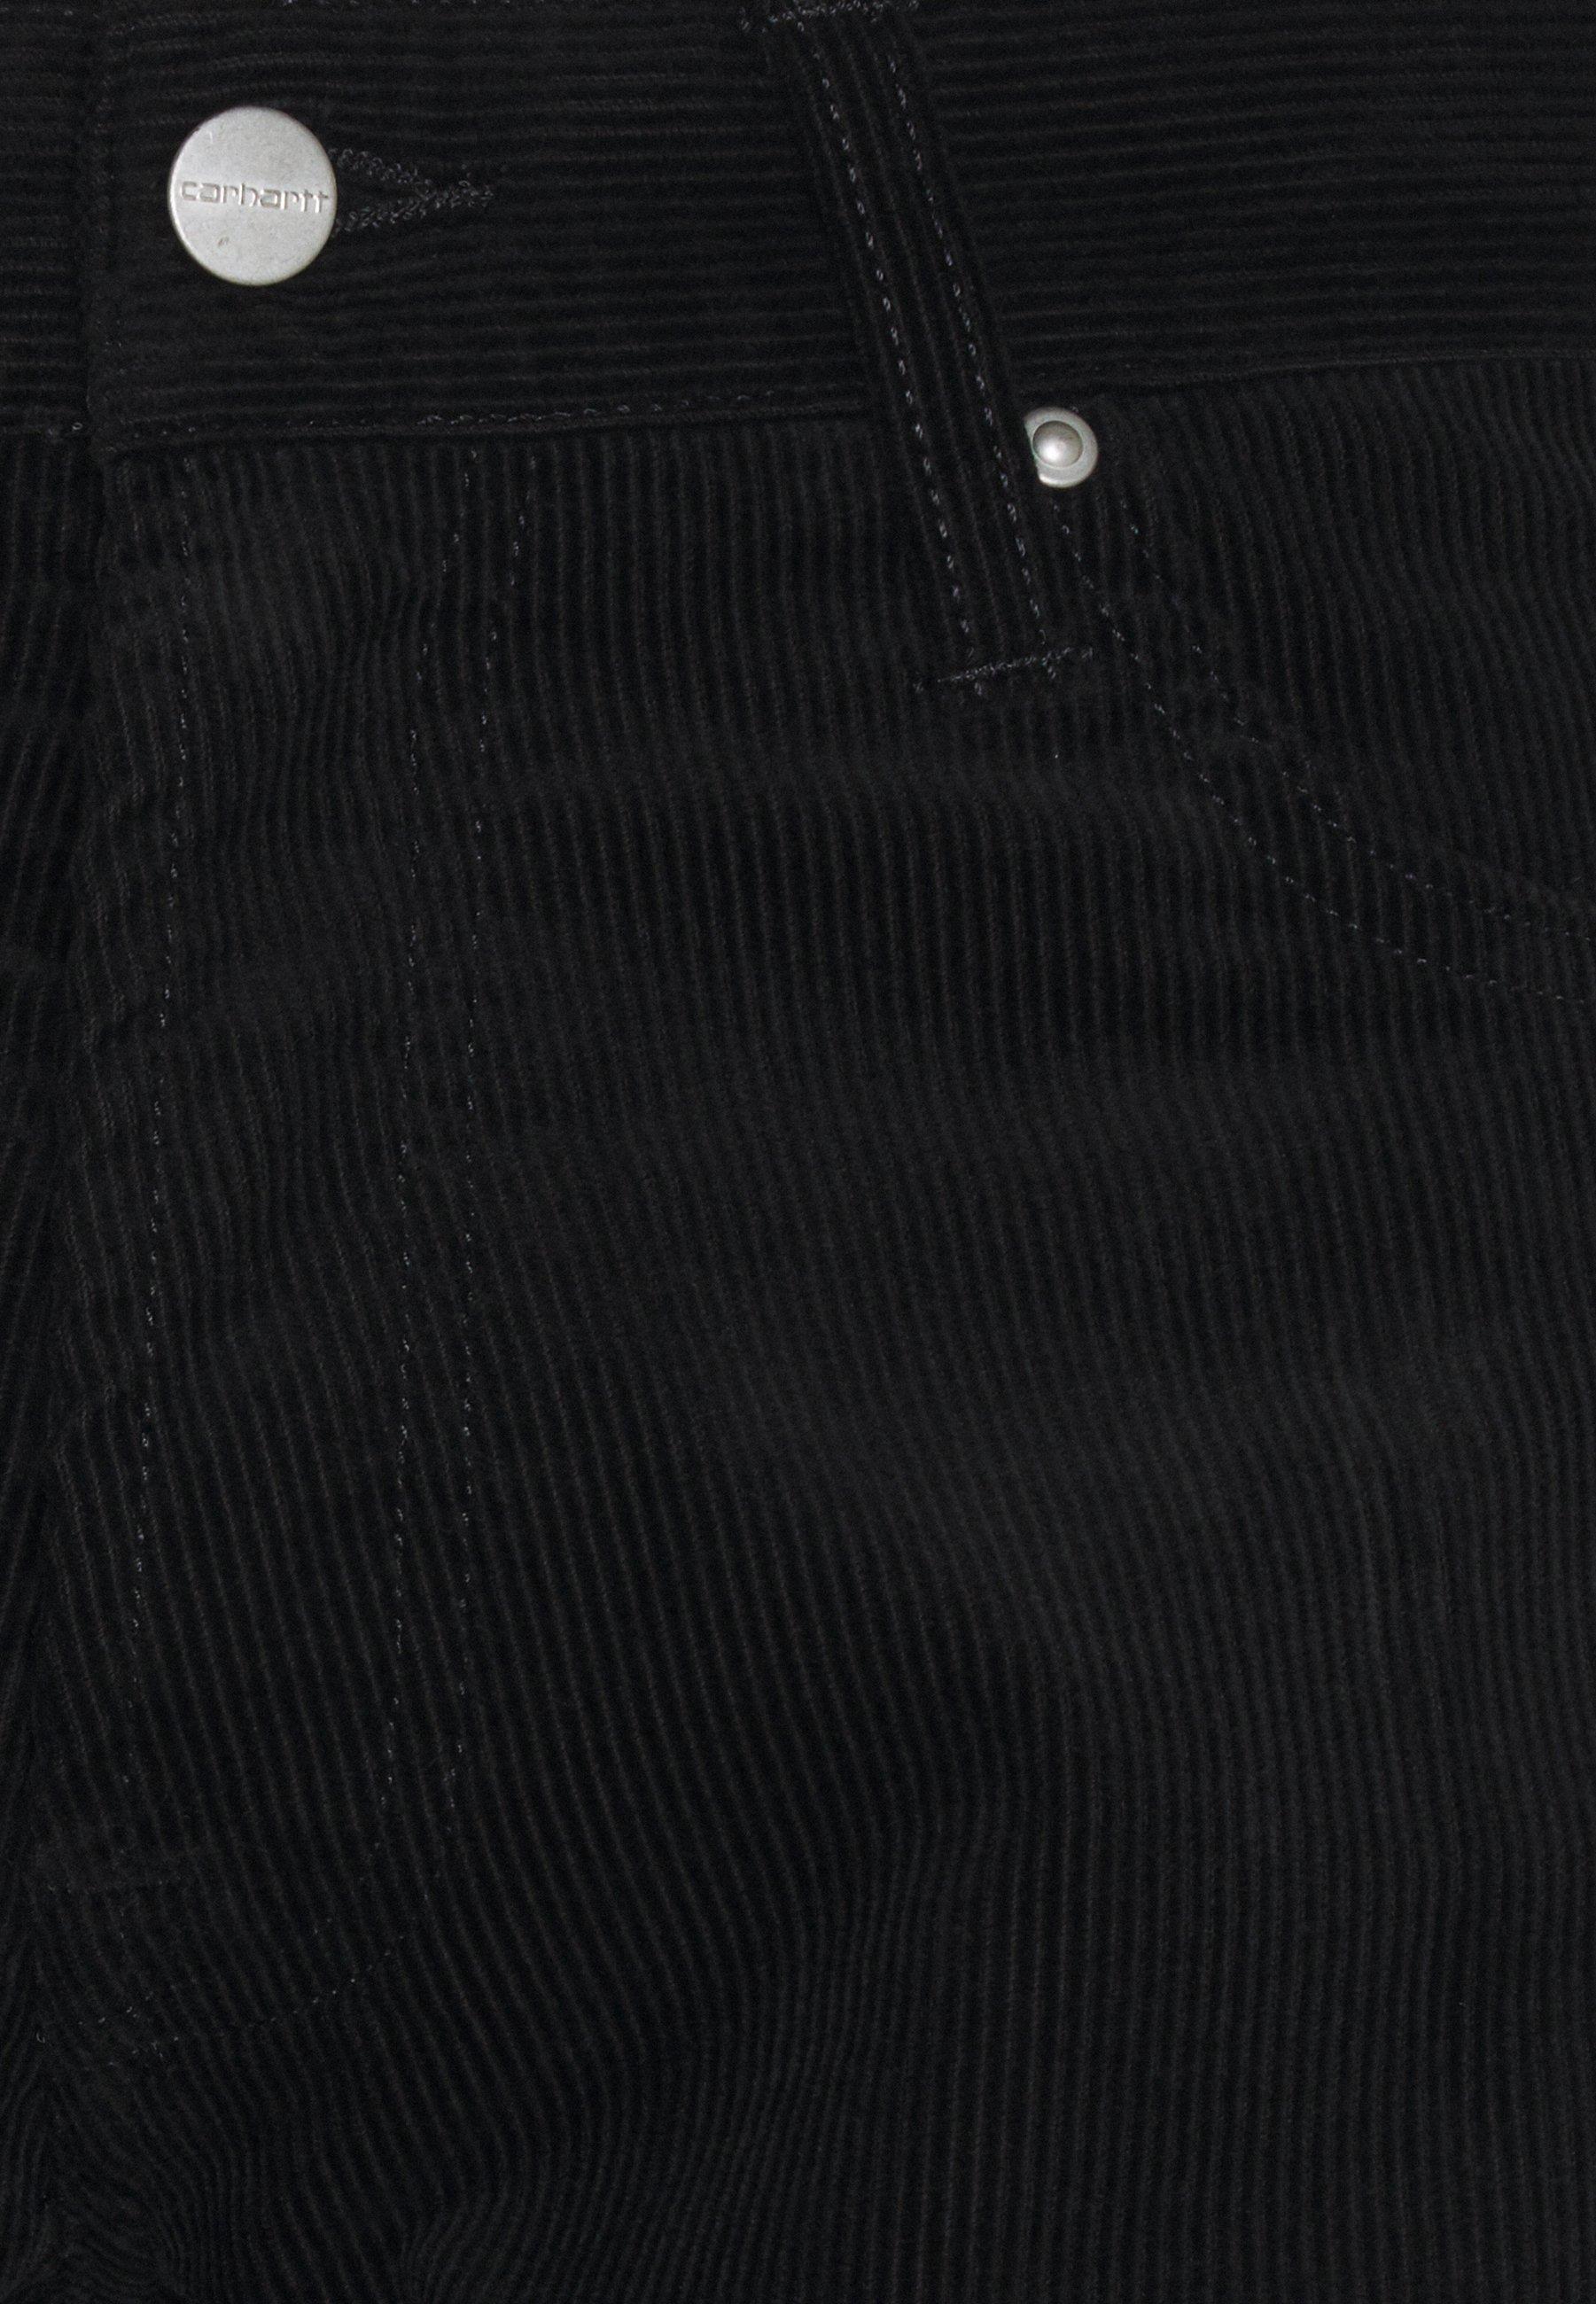 Carhartt WIP KLONDIKE PANT ALBANY - Pantalon classique - black rinsed